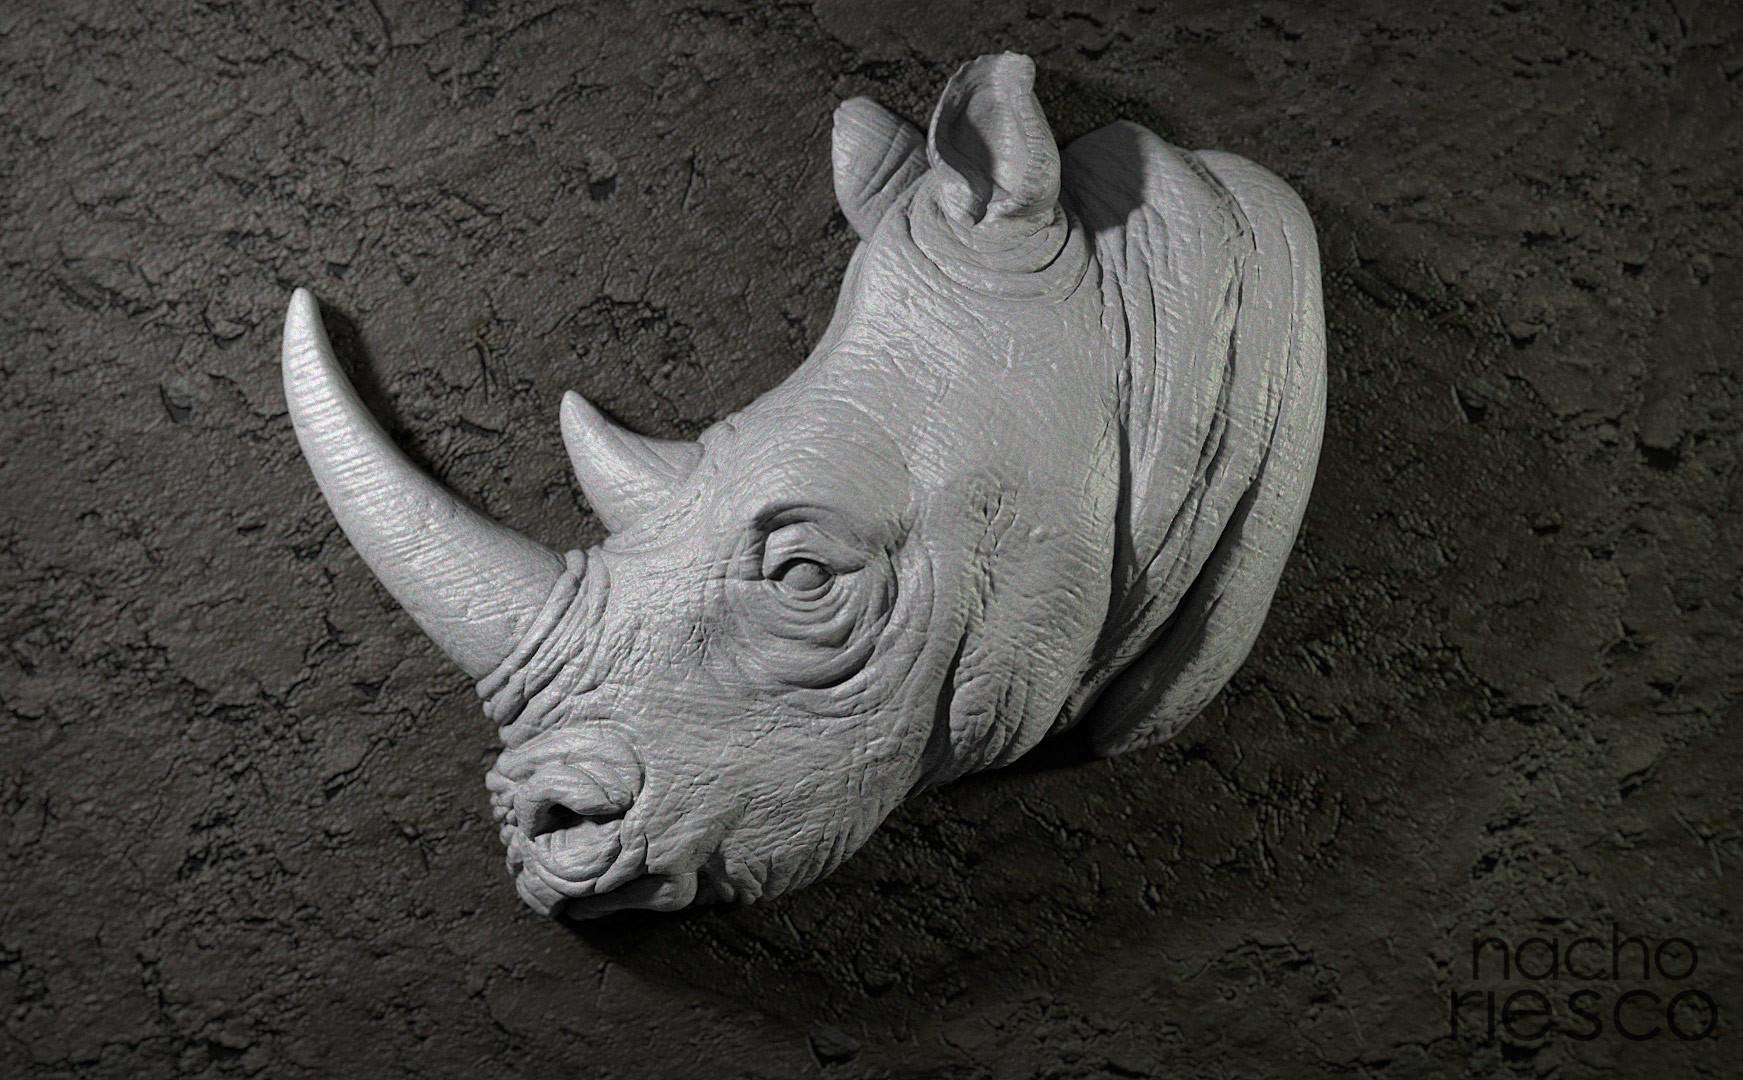 Nacho riesco gostanza rinoceronte 500k